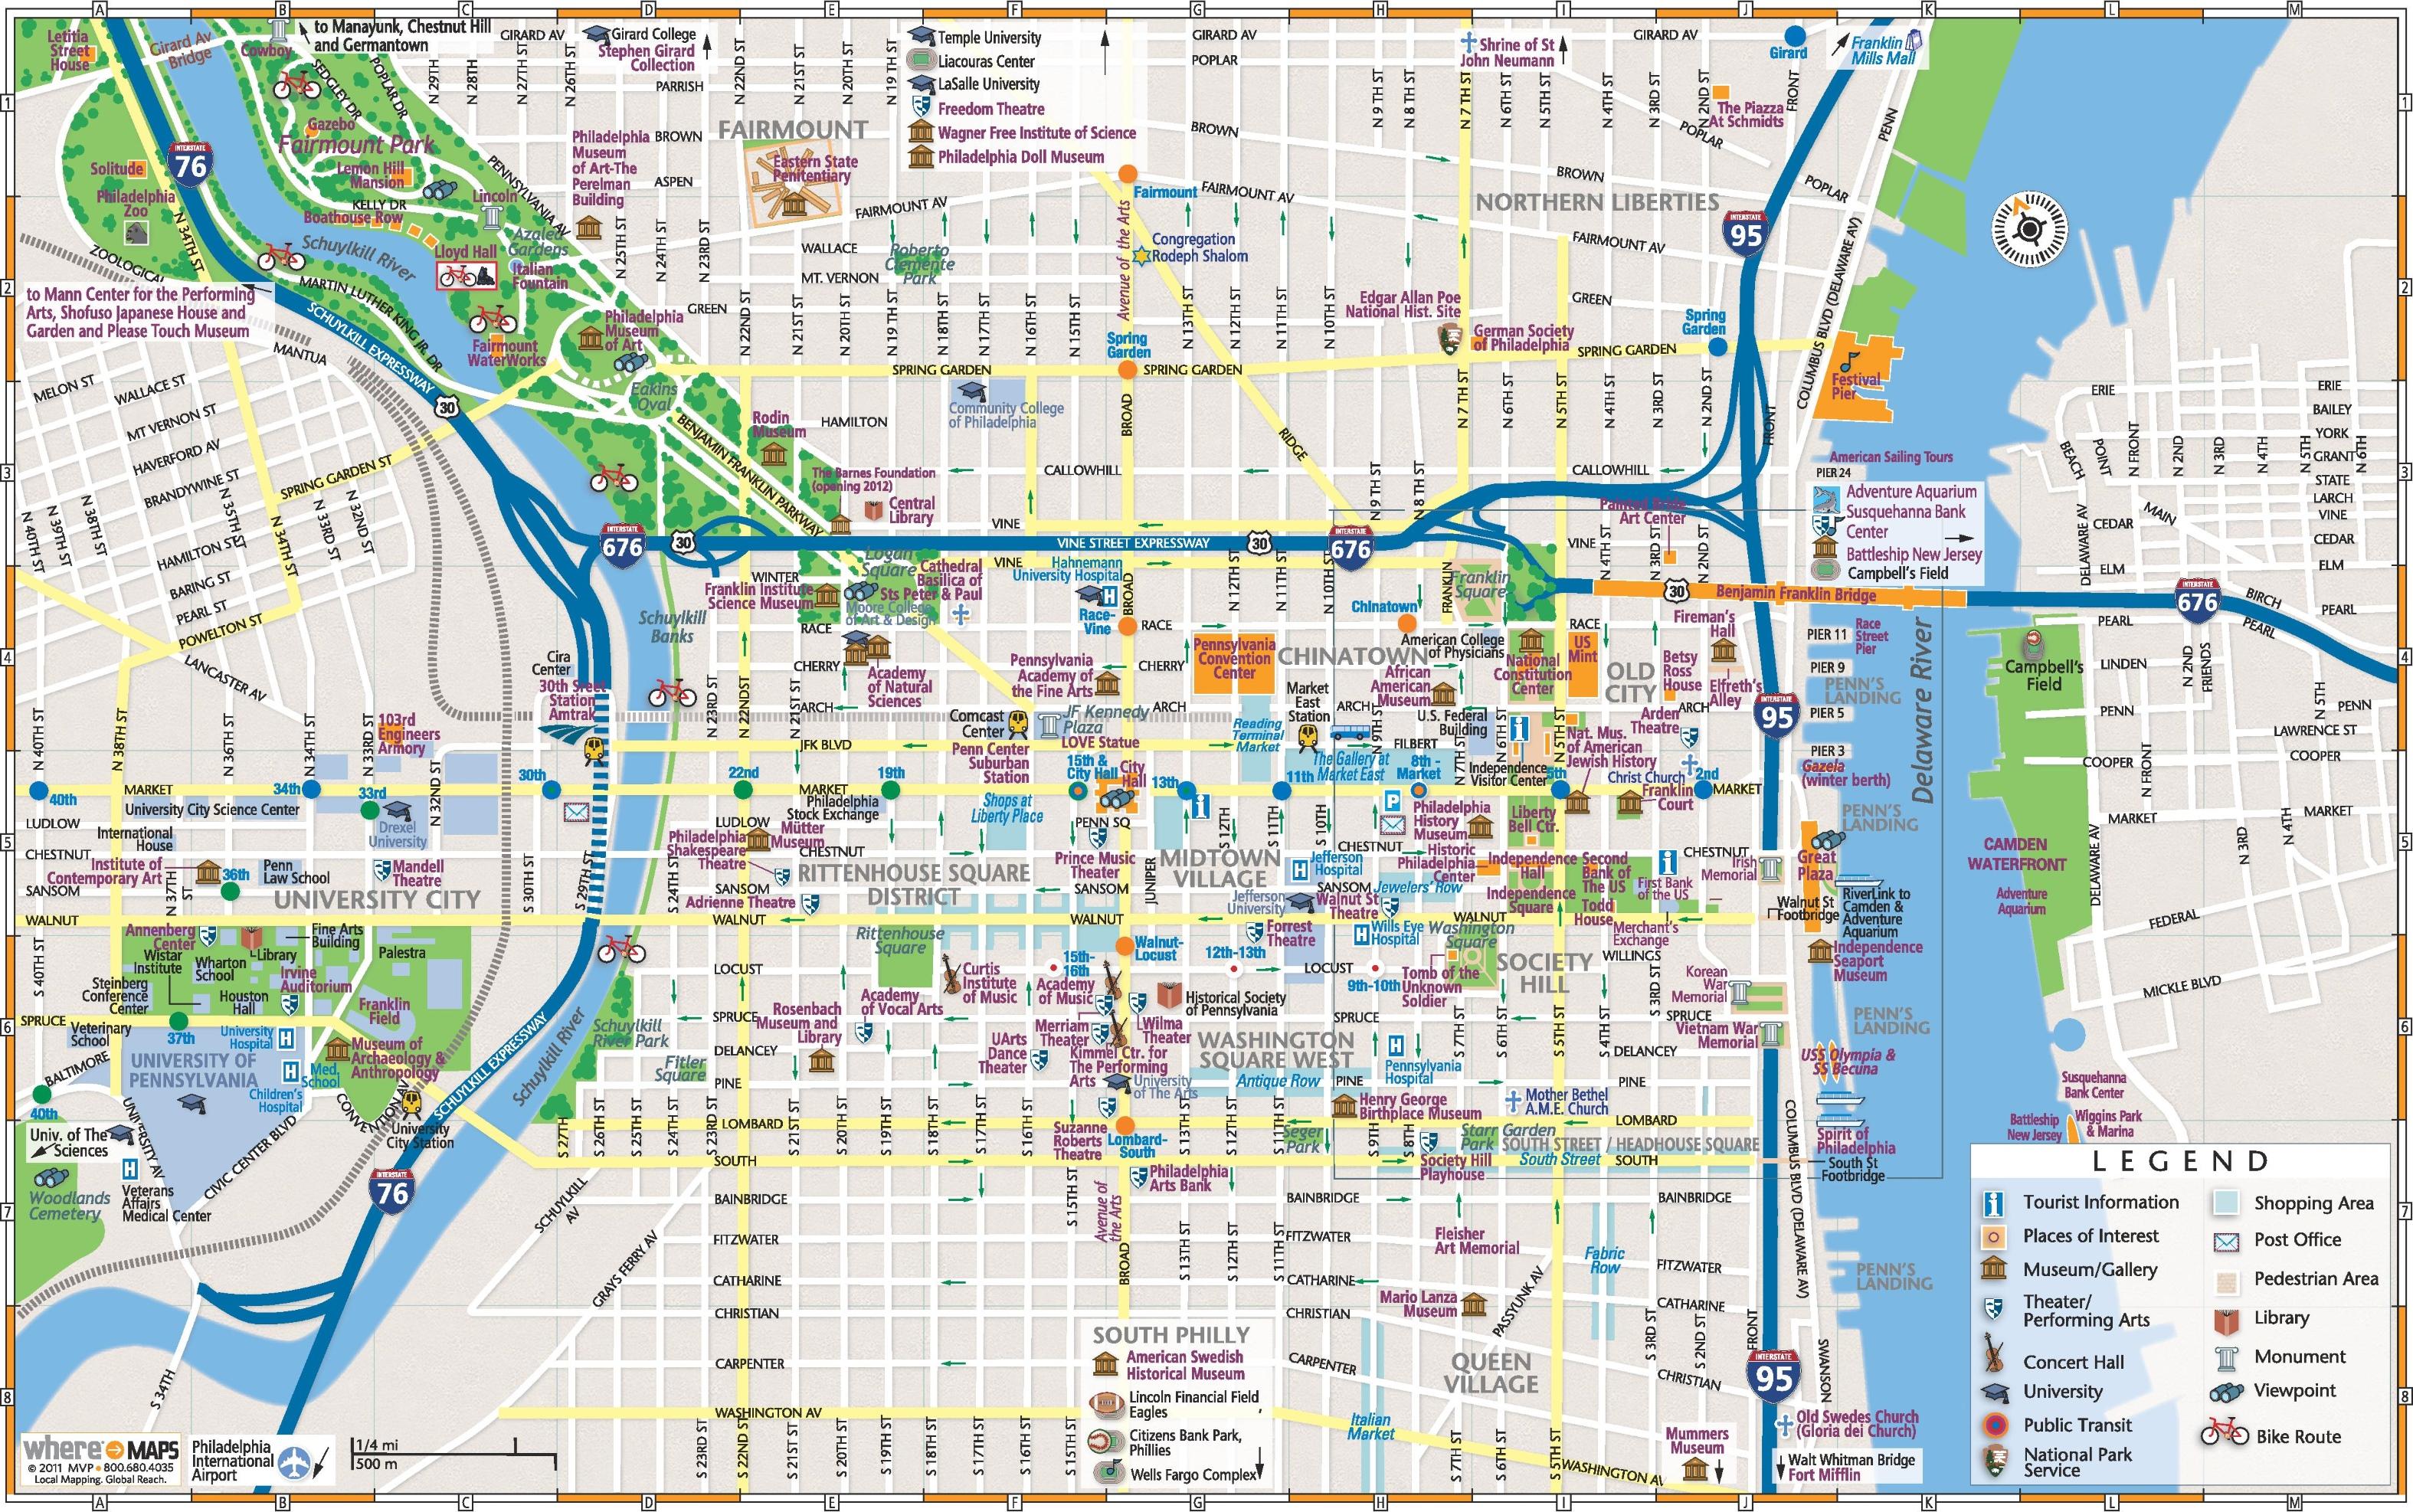 Map Of Philadelphia Philadelphia downtown map Map Of Philadelphia